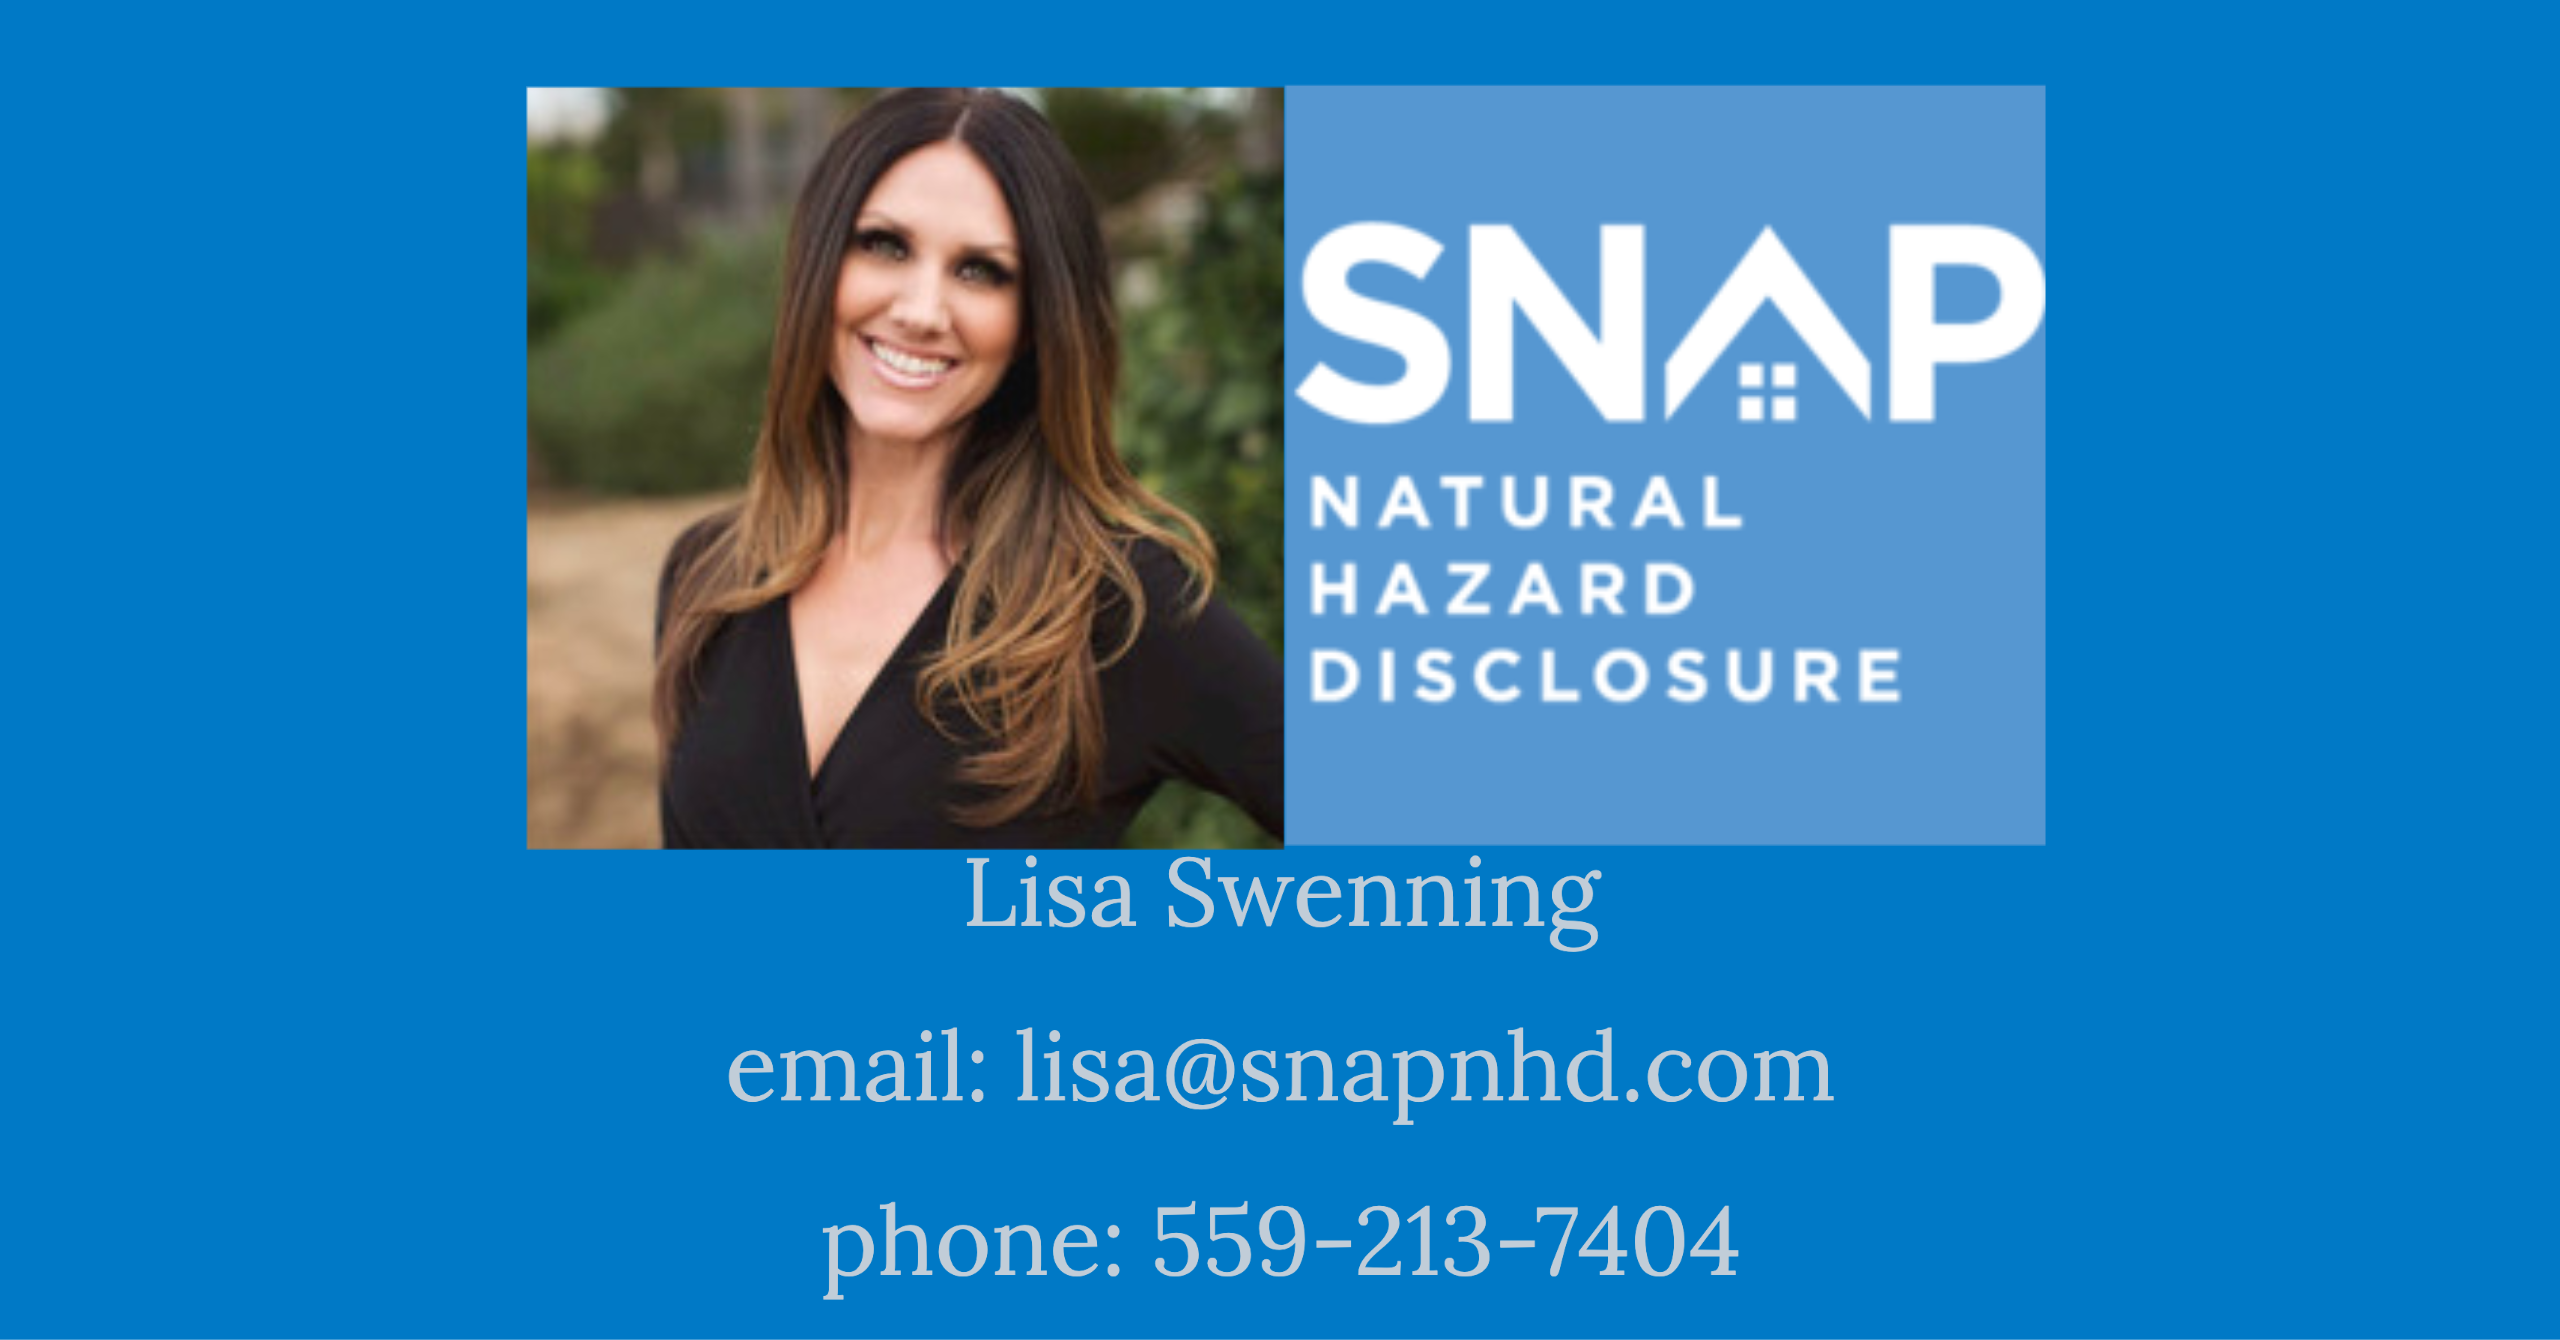 Lisa Swenning